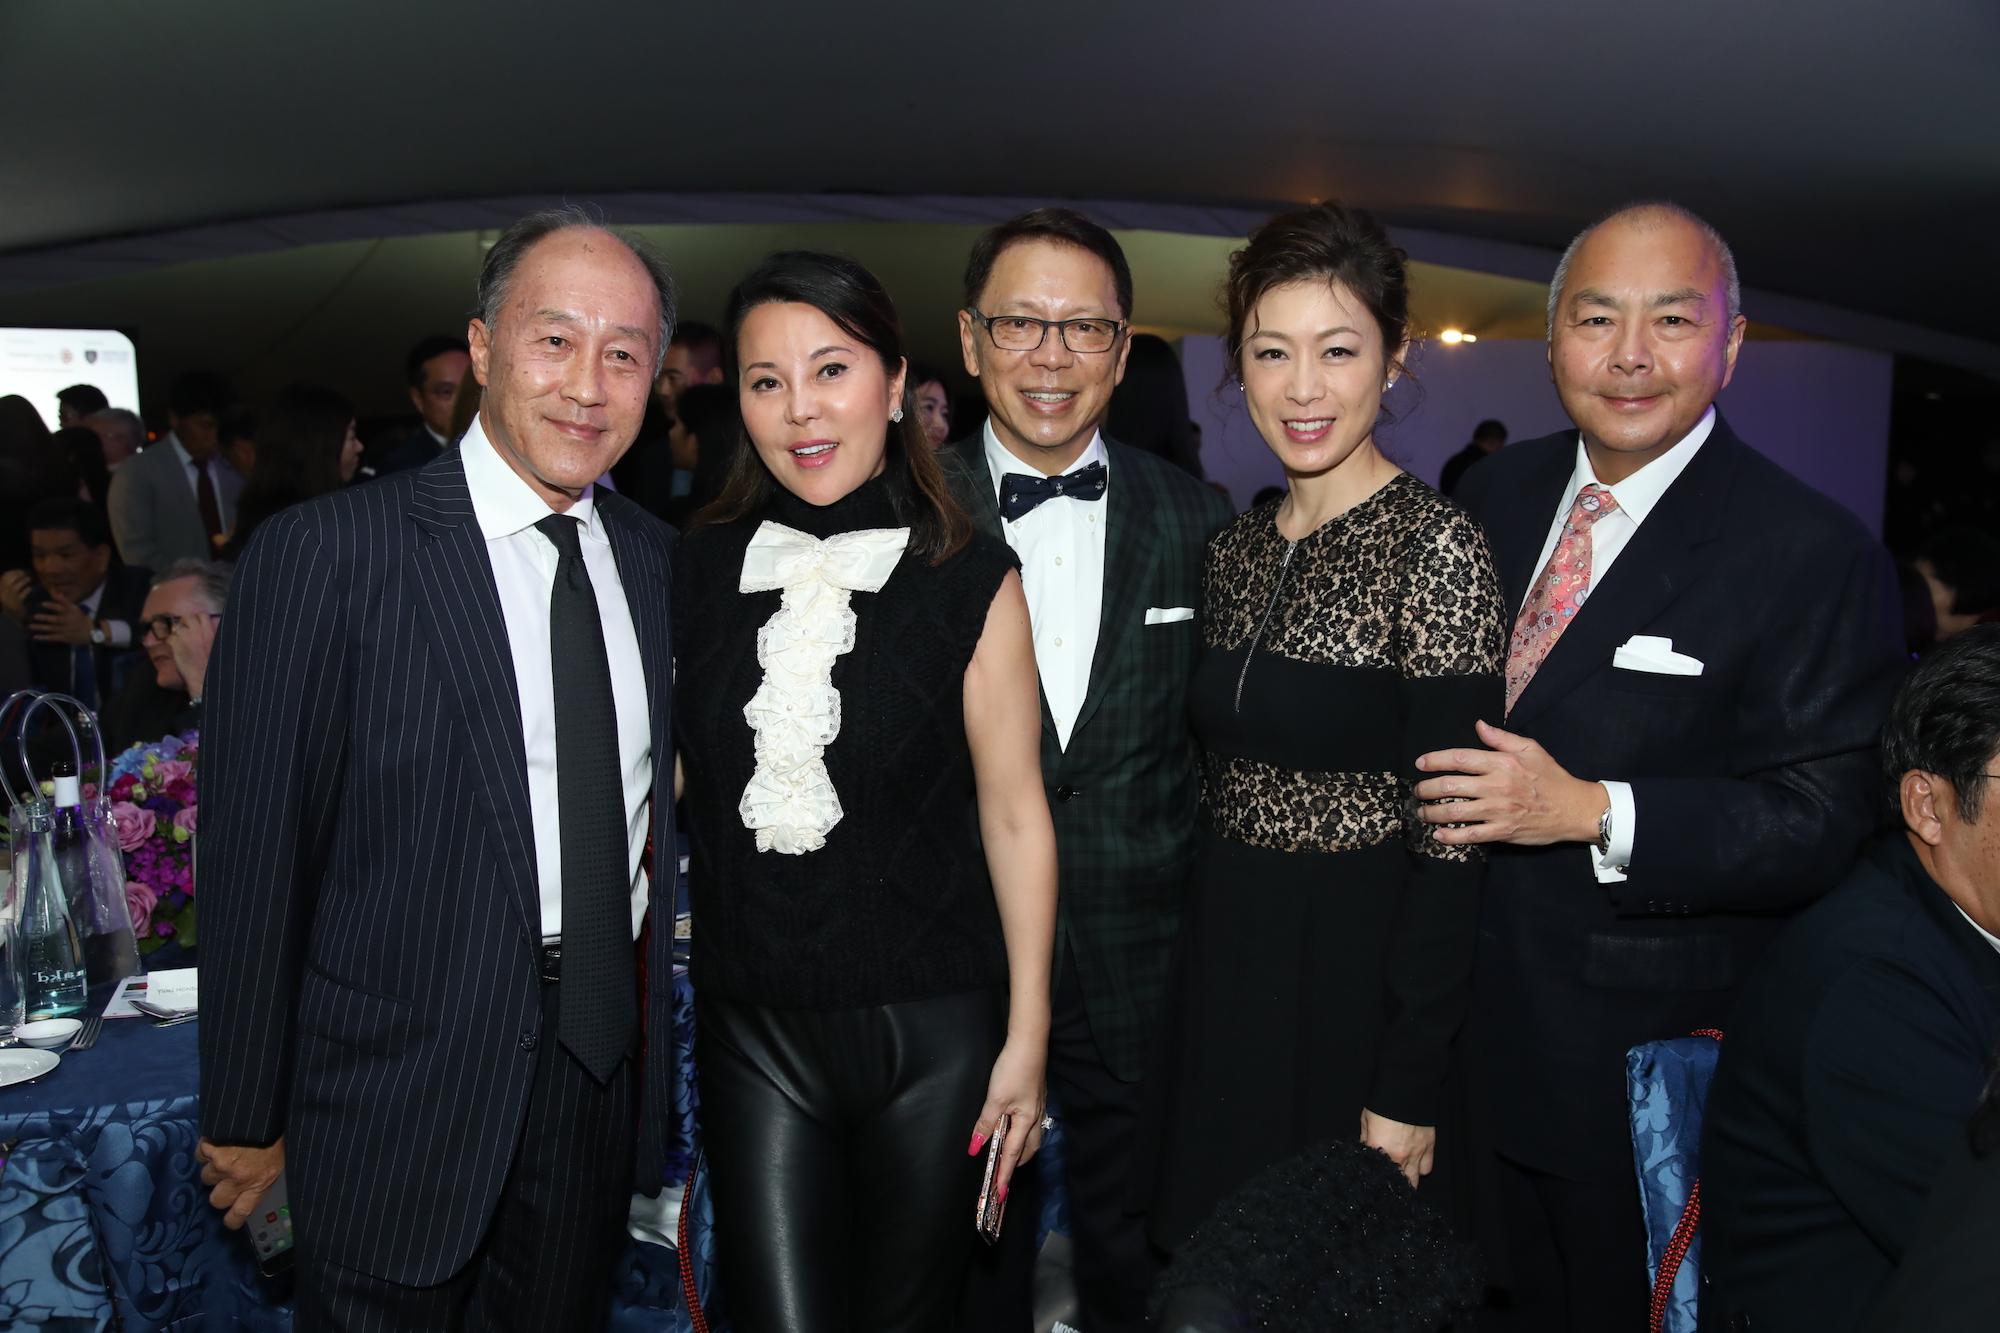 Edmund Li, Yumi Honda, Caleb Chan, Emily Yeung, Joseph Fung